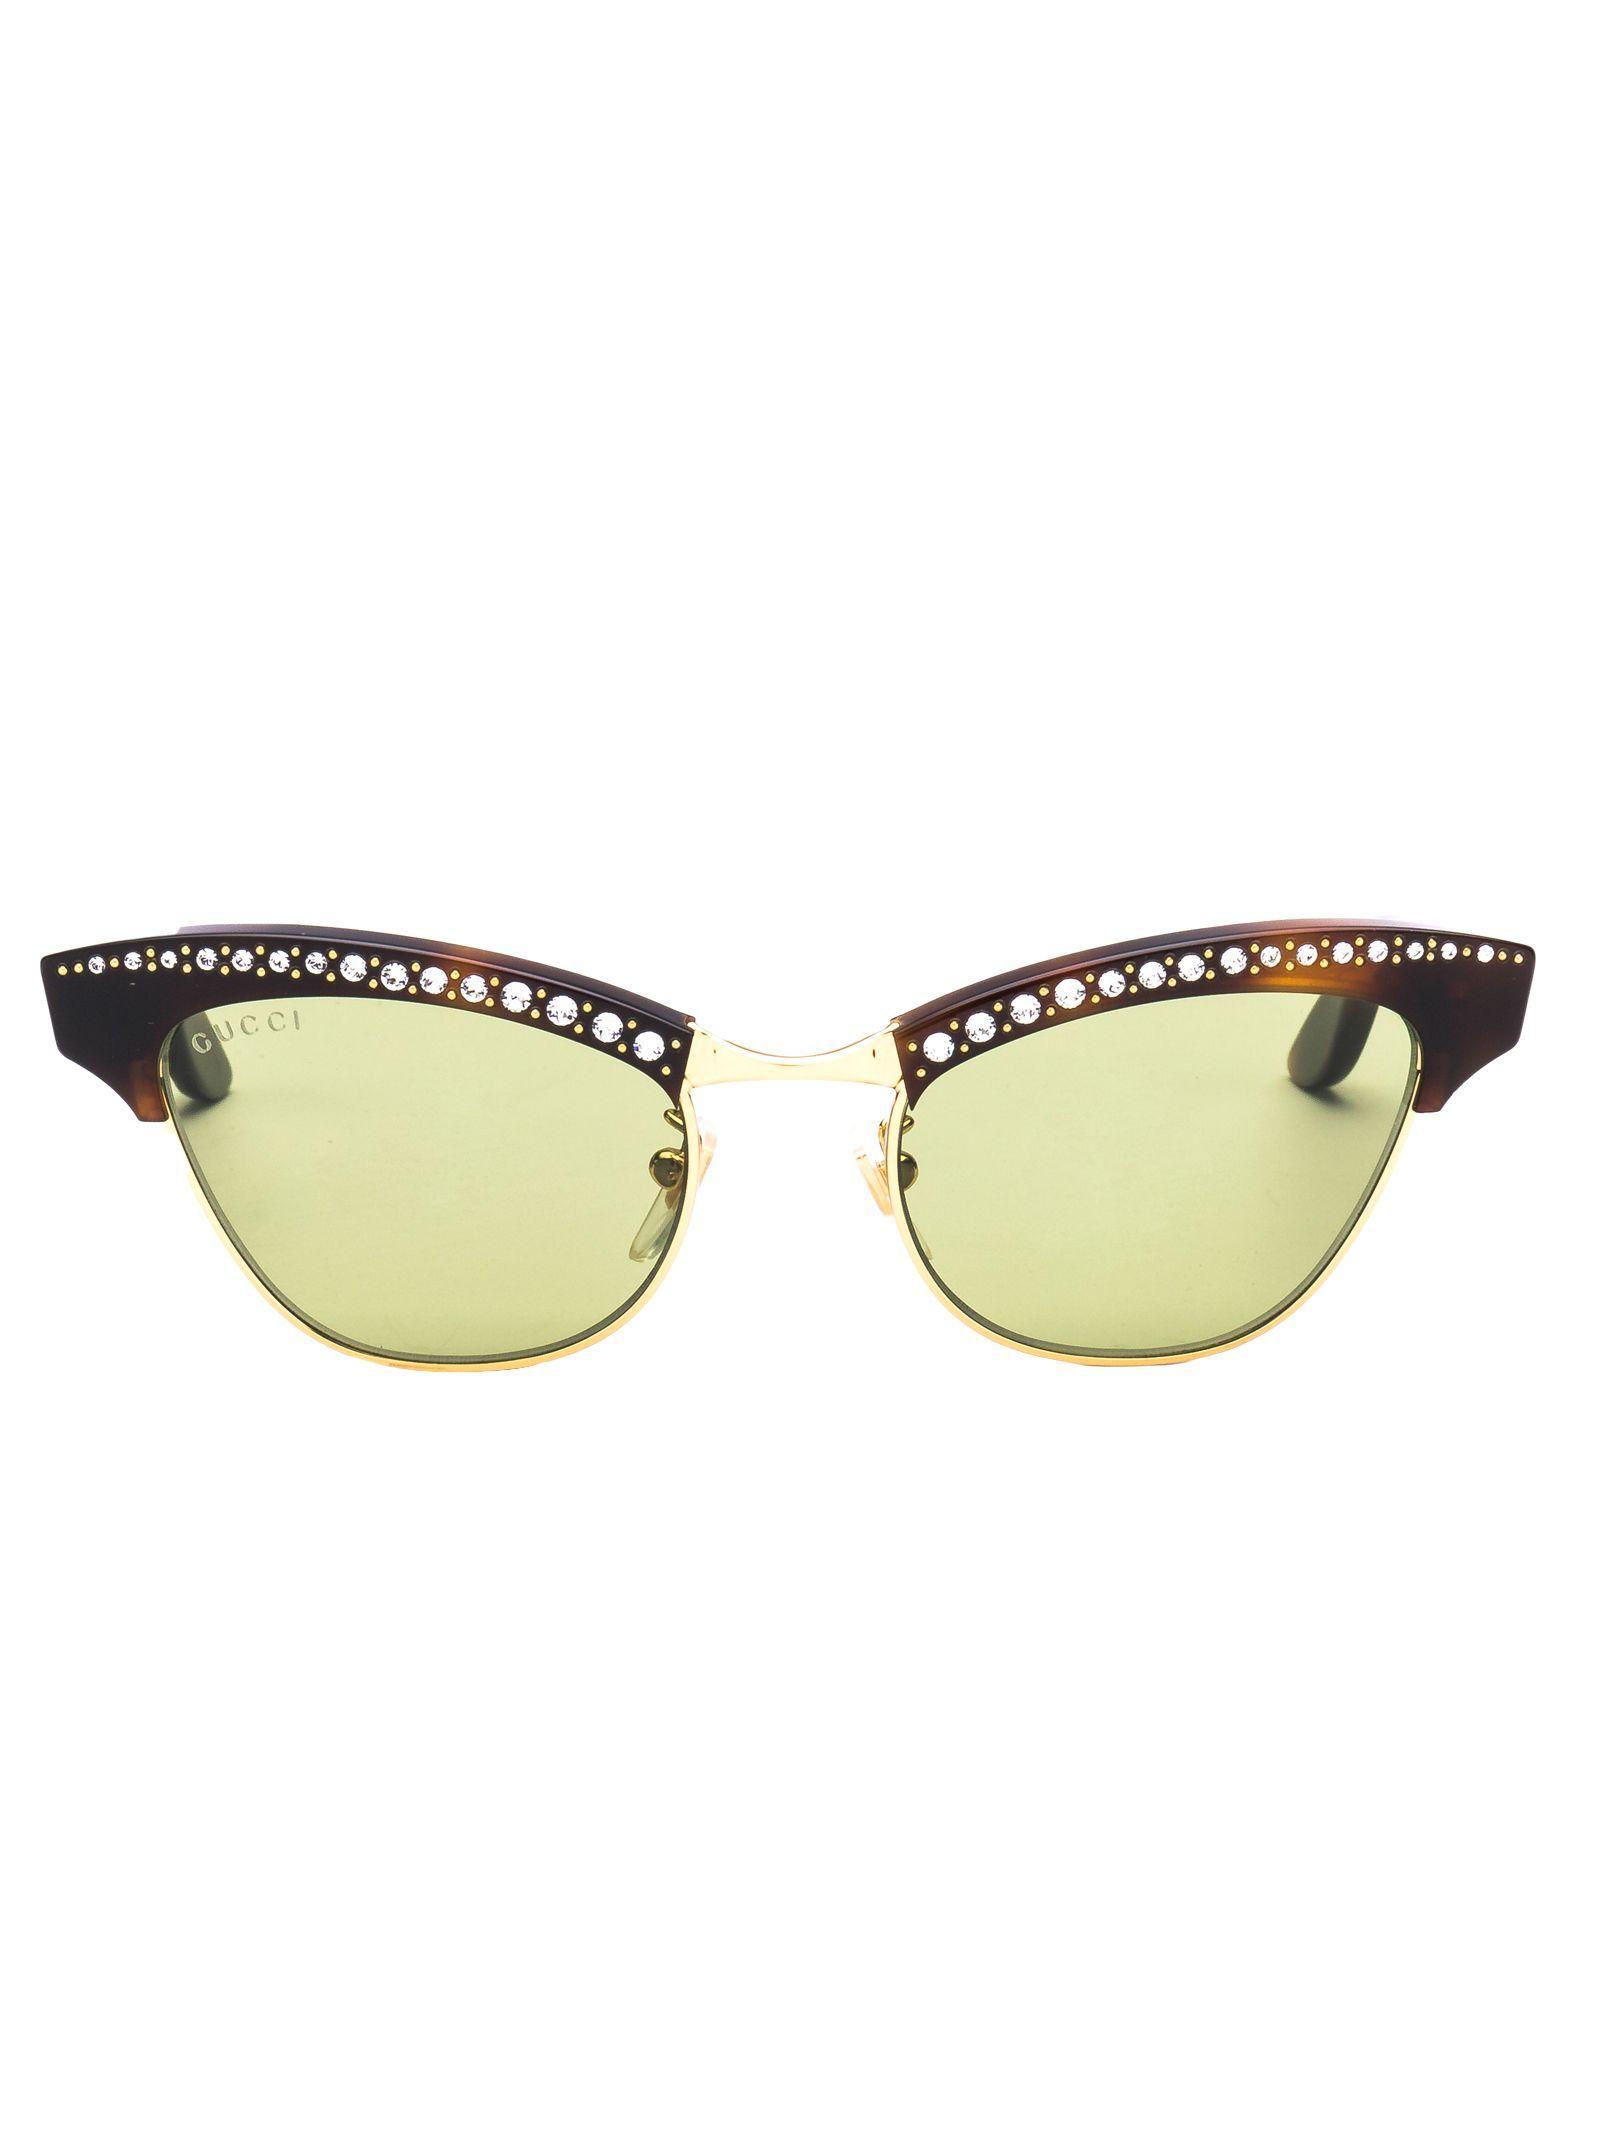 ac95c6ce9024 GUCCI EYEWEAR CRYSTAL EMBELLISHED SUNGLASSES. #gucci | Sunglasses ...